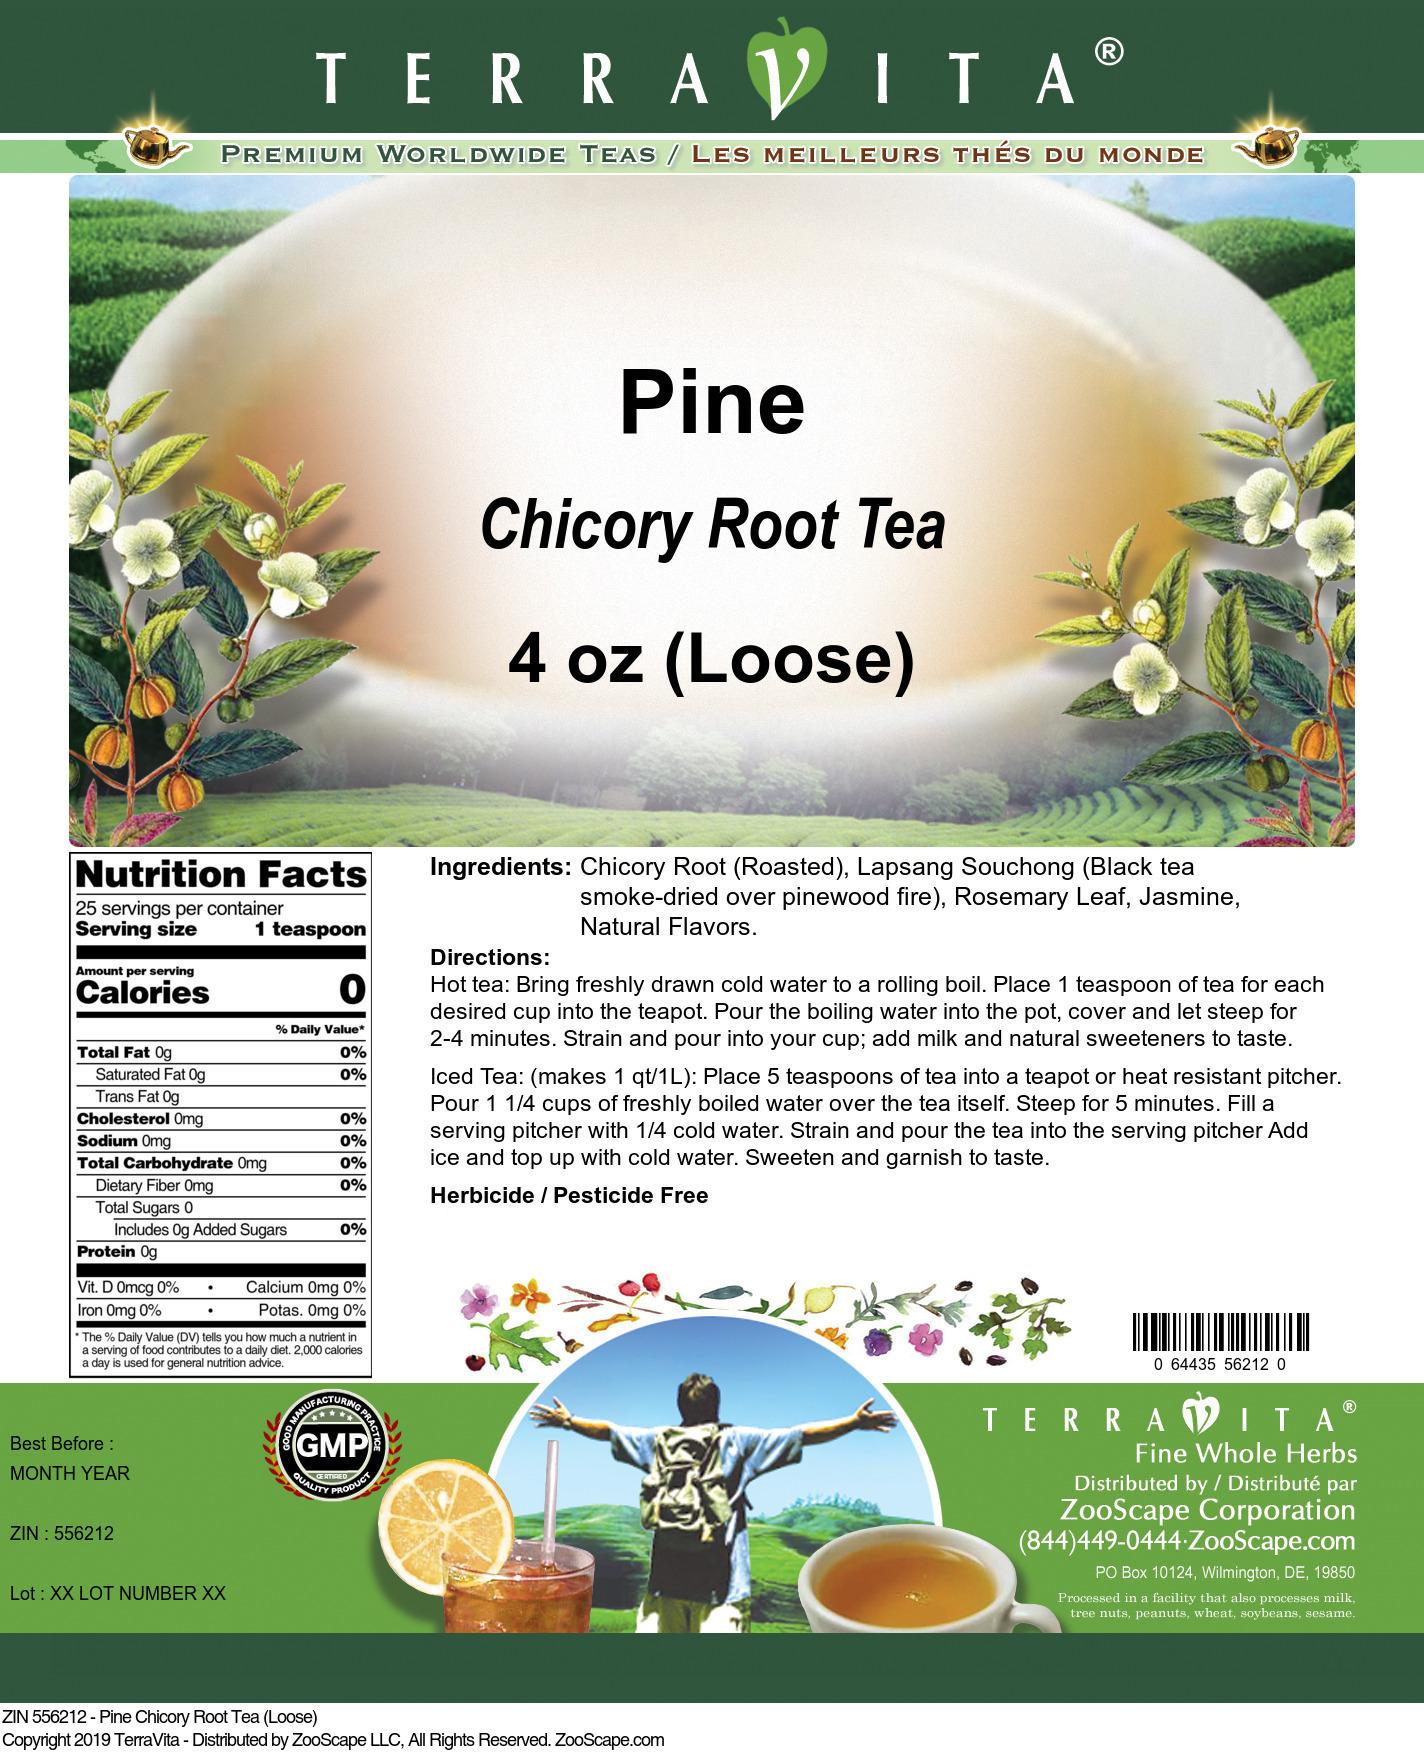 Pine Chicory Root Tea (Loose)